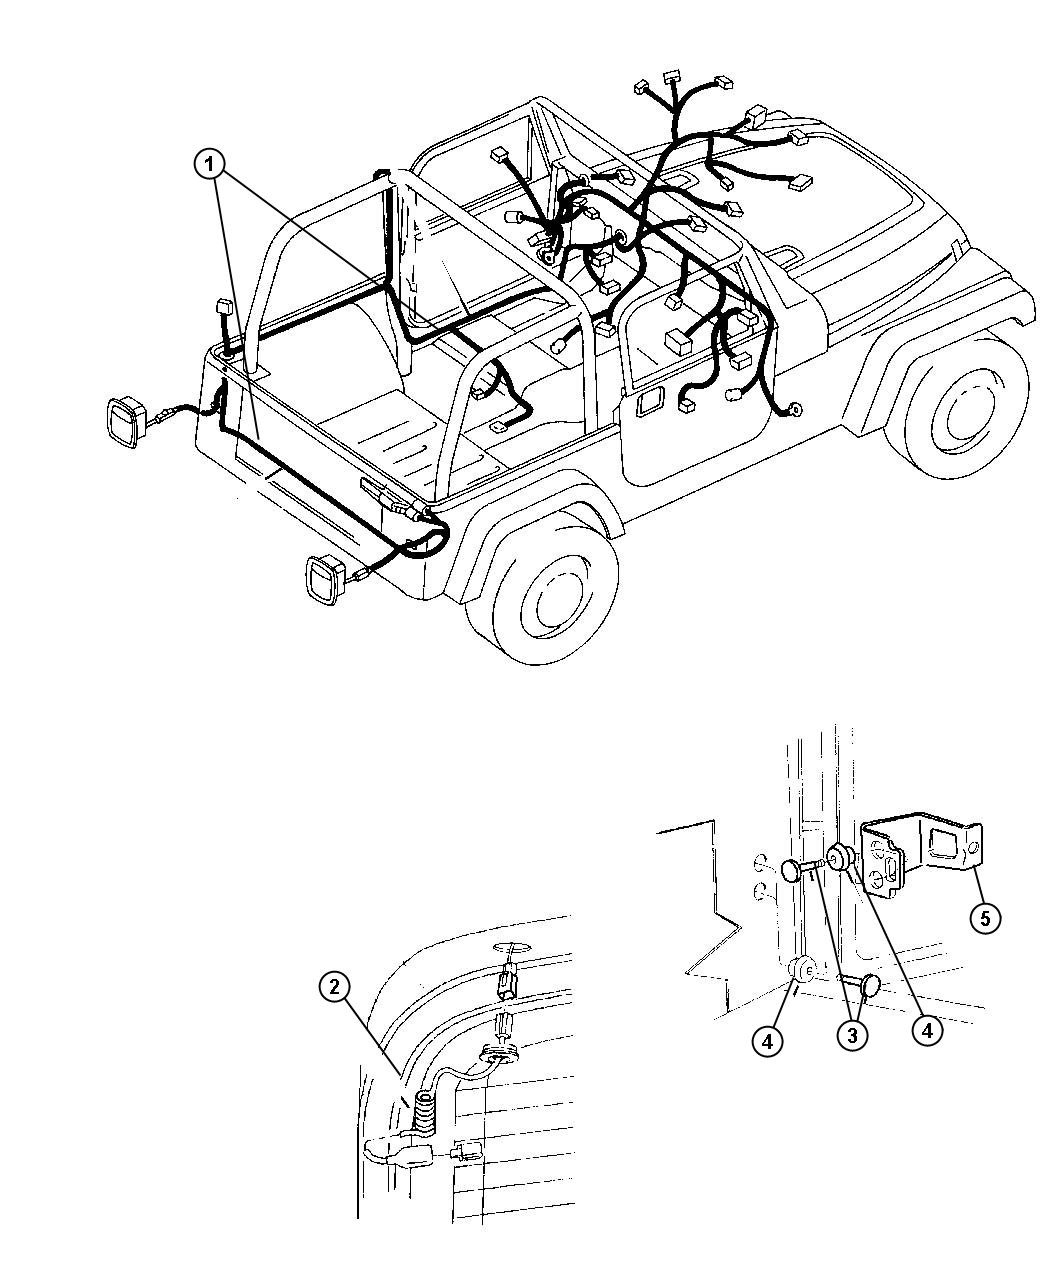 Jeep Wrangler Clamp. Contact button. Contact cover pn